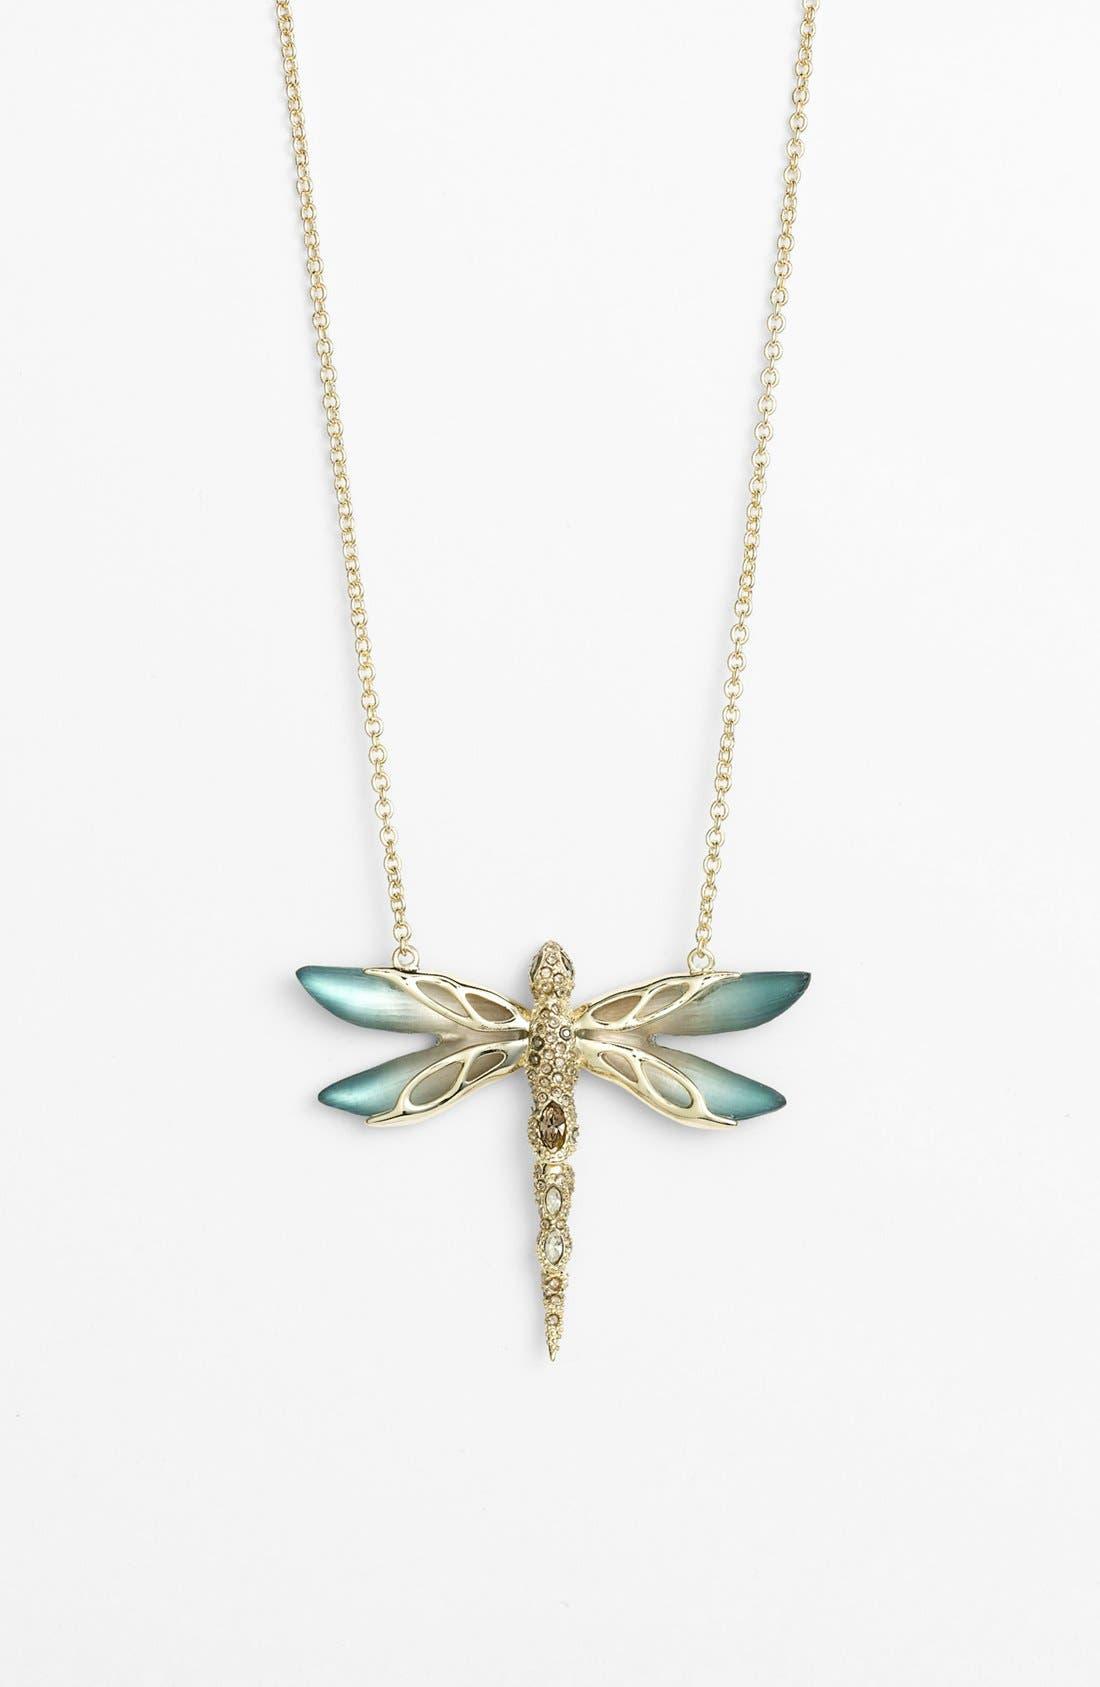 Main Image - Alexis Bittar 'Lucite® - Neo Bohemian' Pavé Dragonfly Pendant Necklace